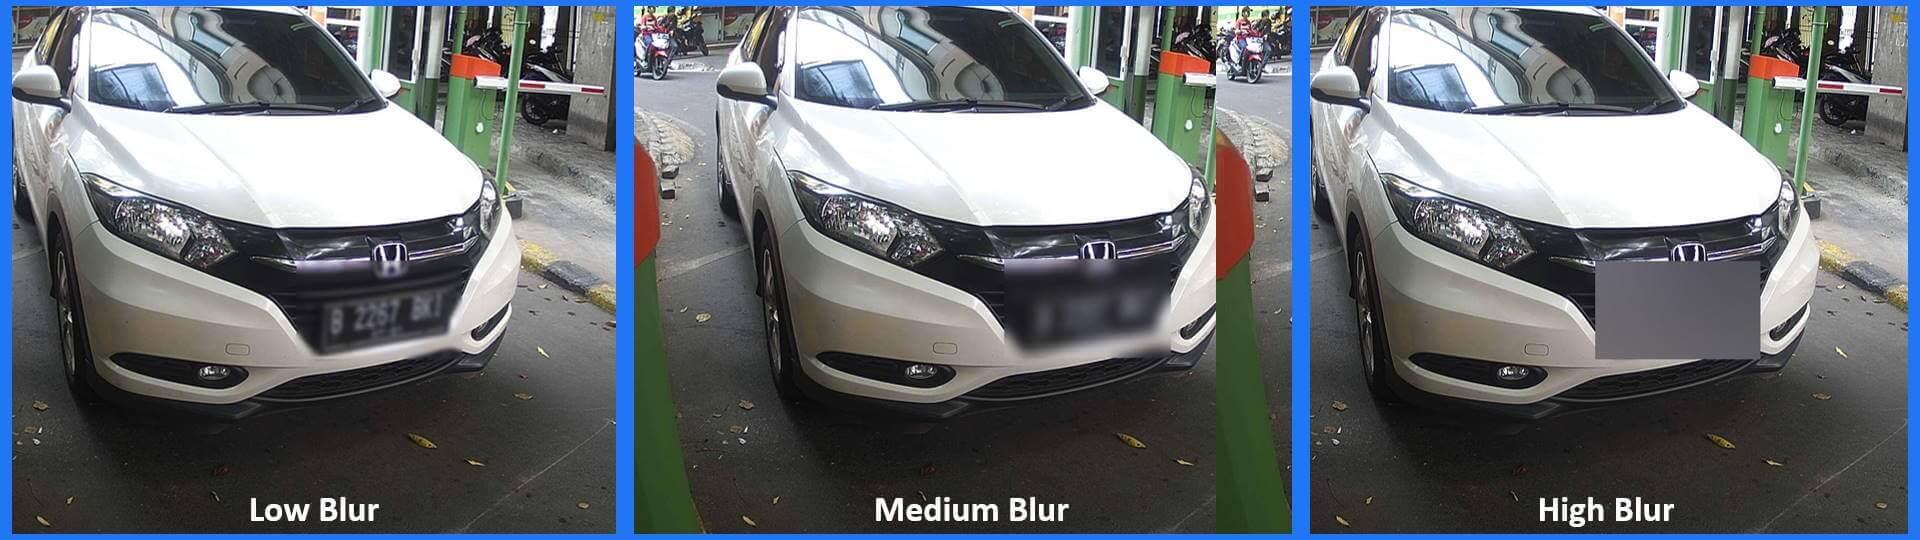 Blur License Plate Level